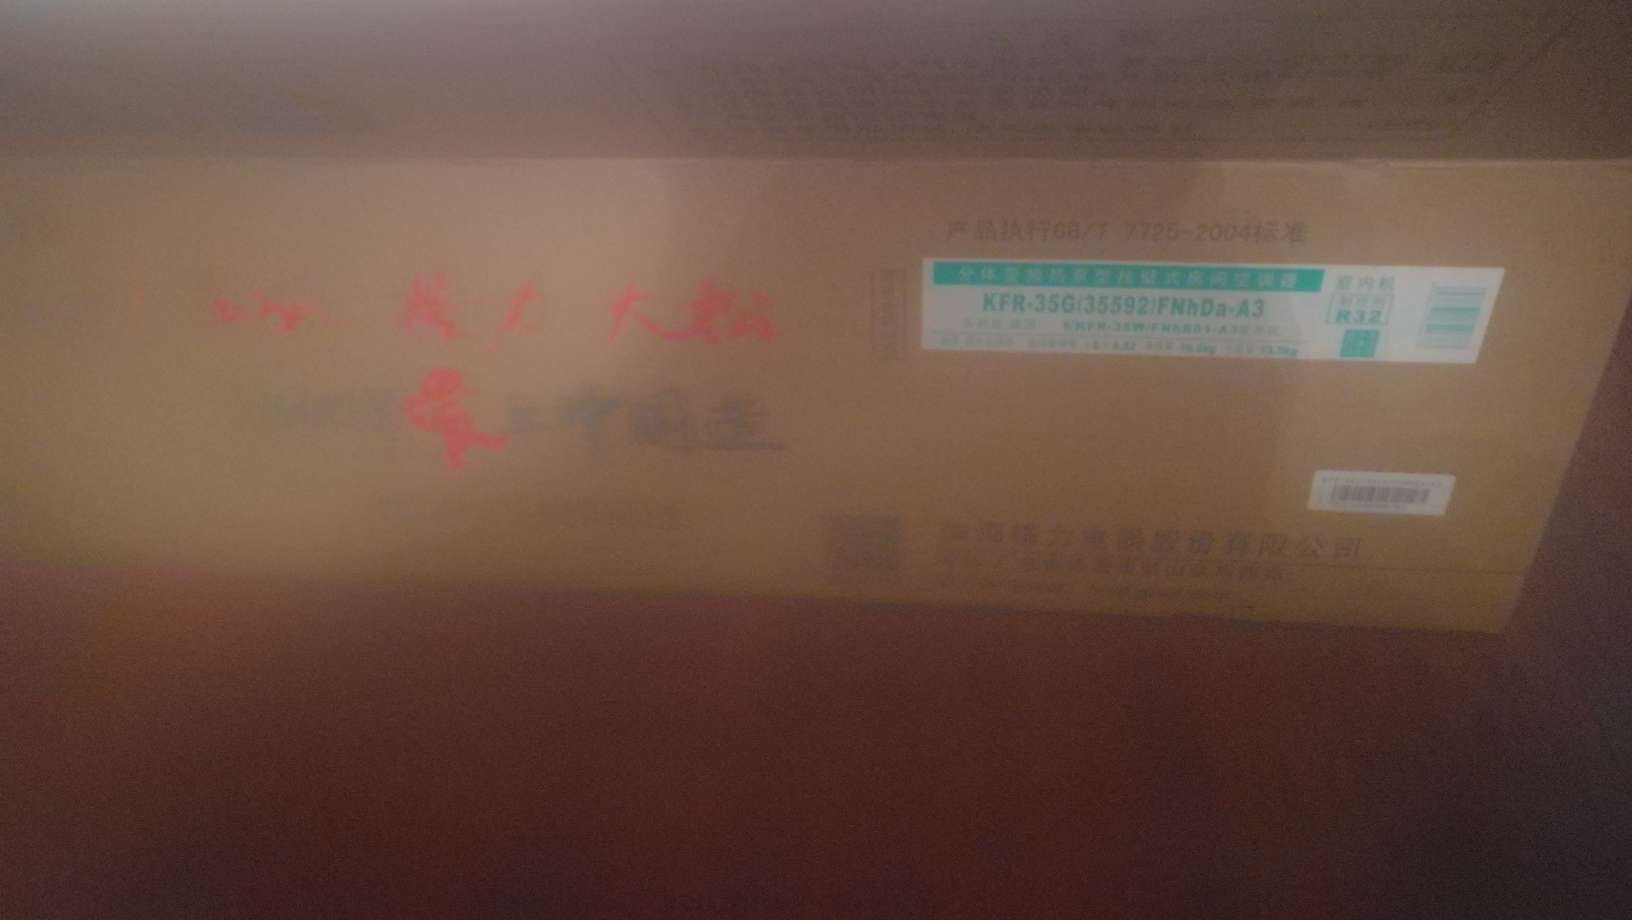 jordan black red and purple 00990534 cheapest